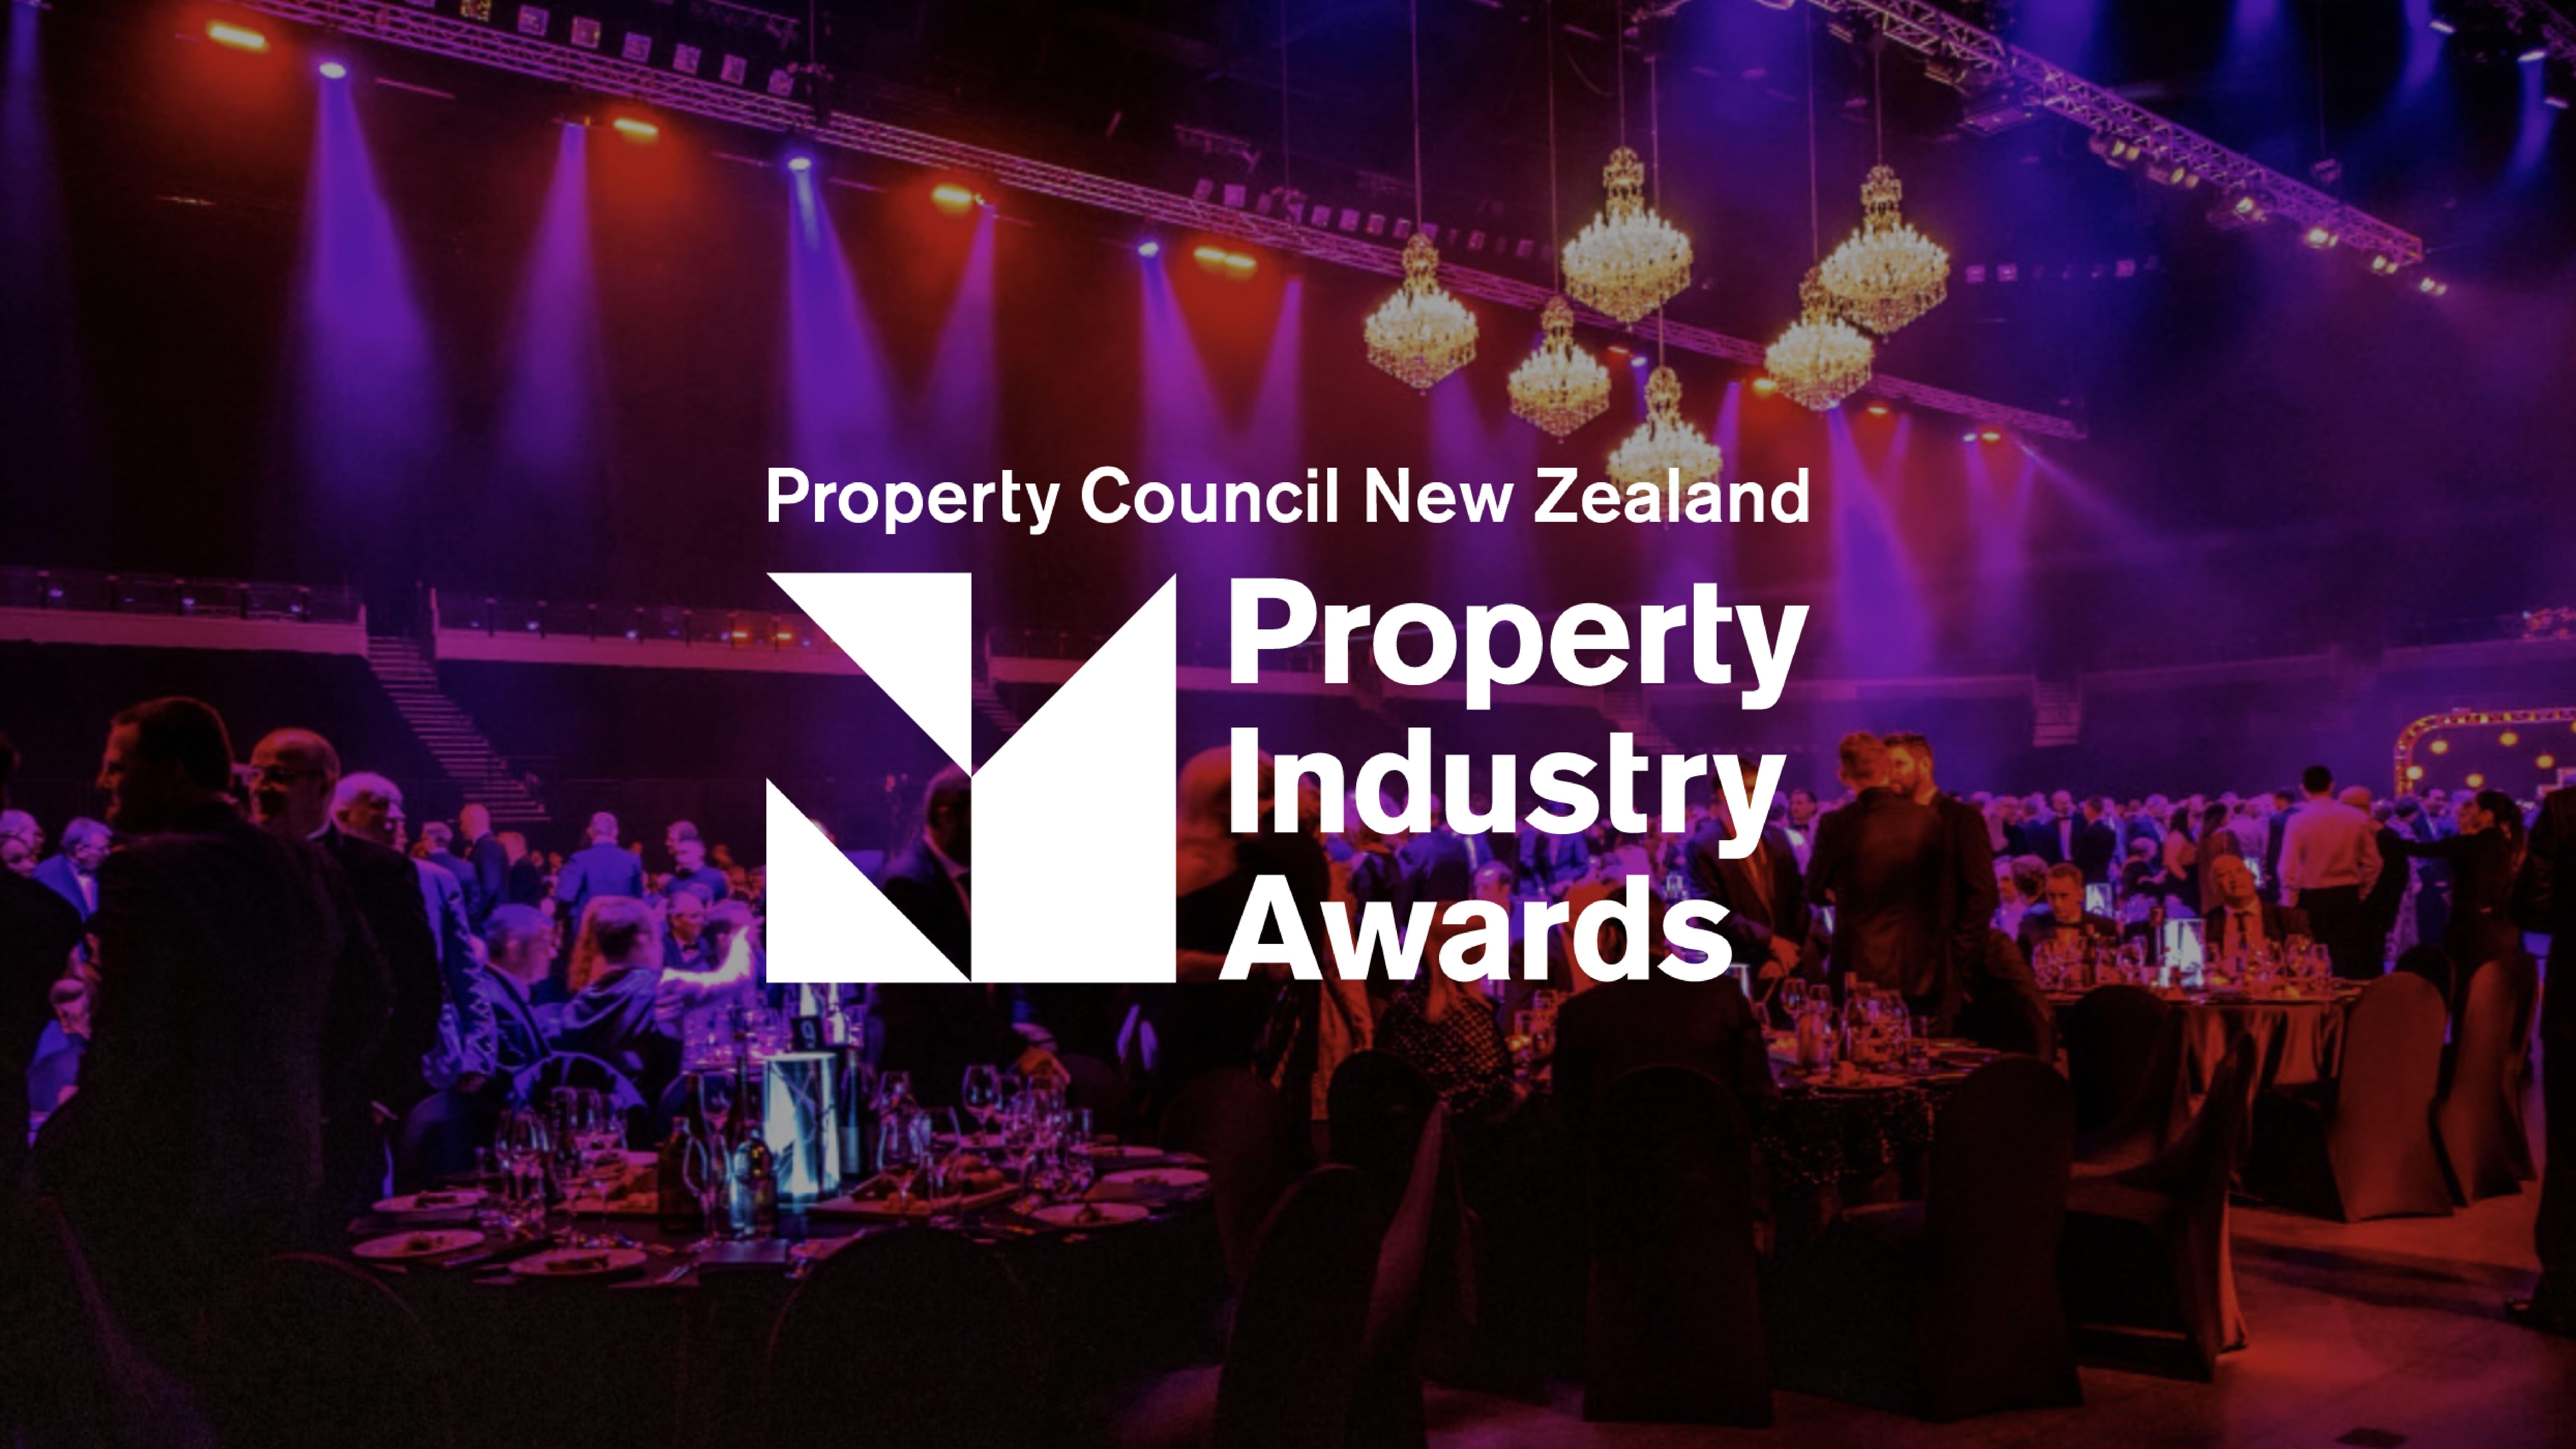 attraction studio pcnz brand environmental property industry awards logo